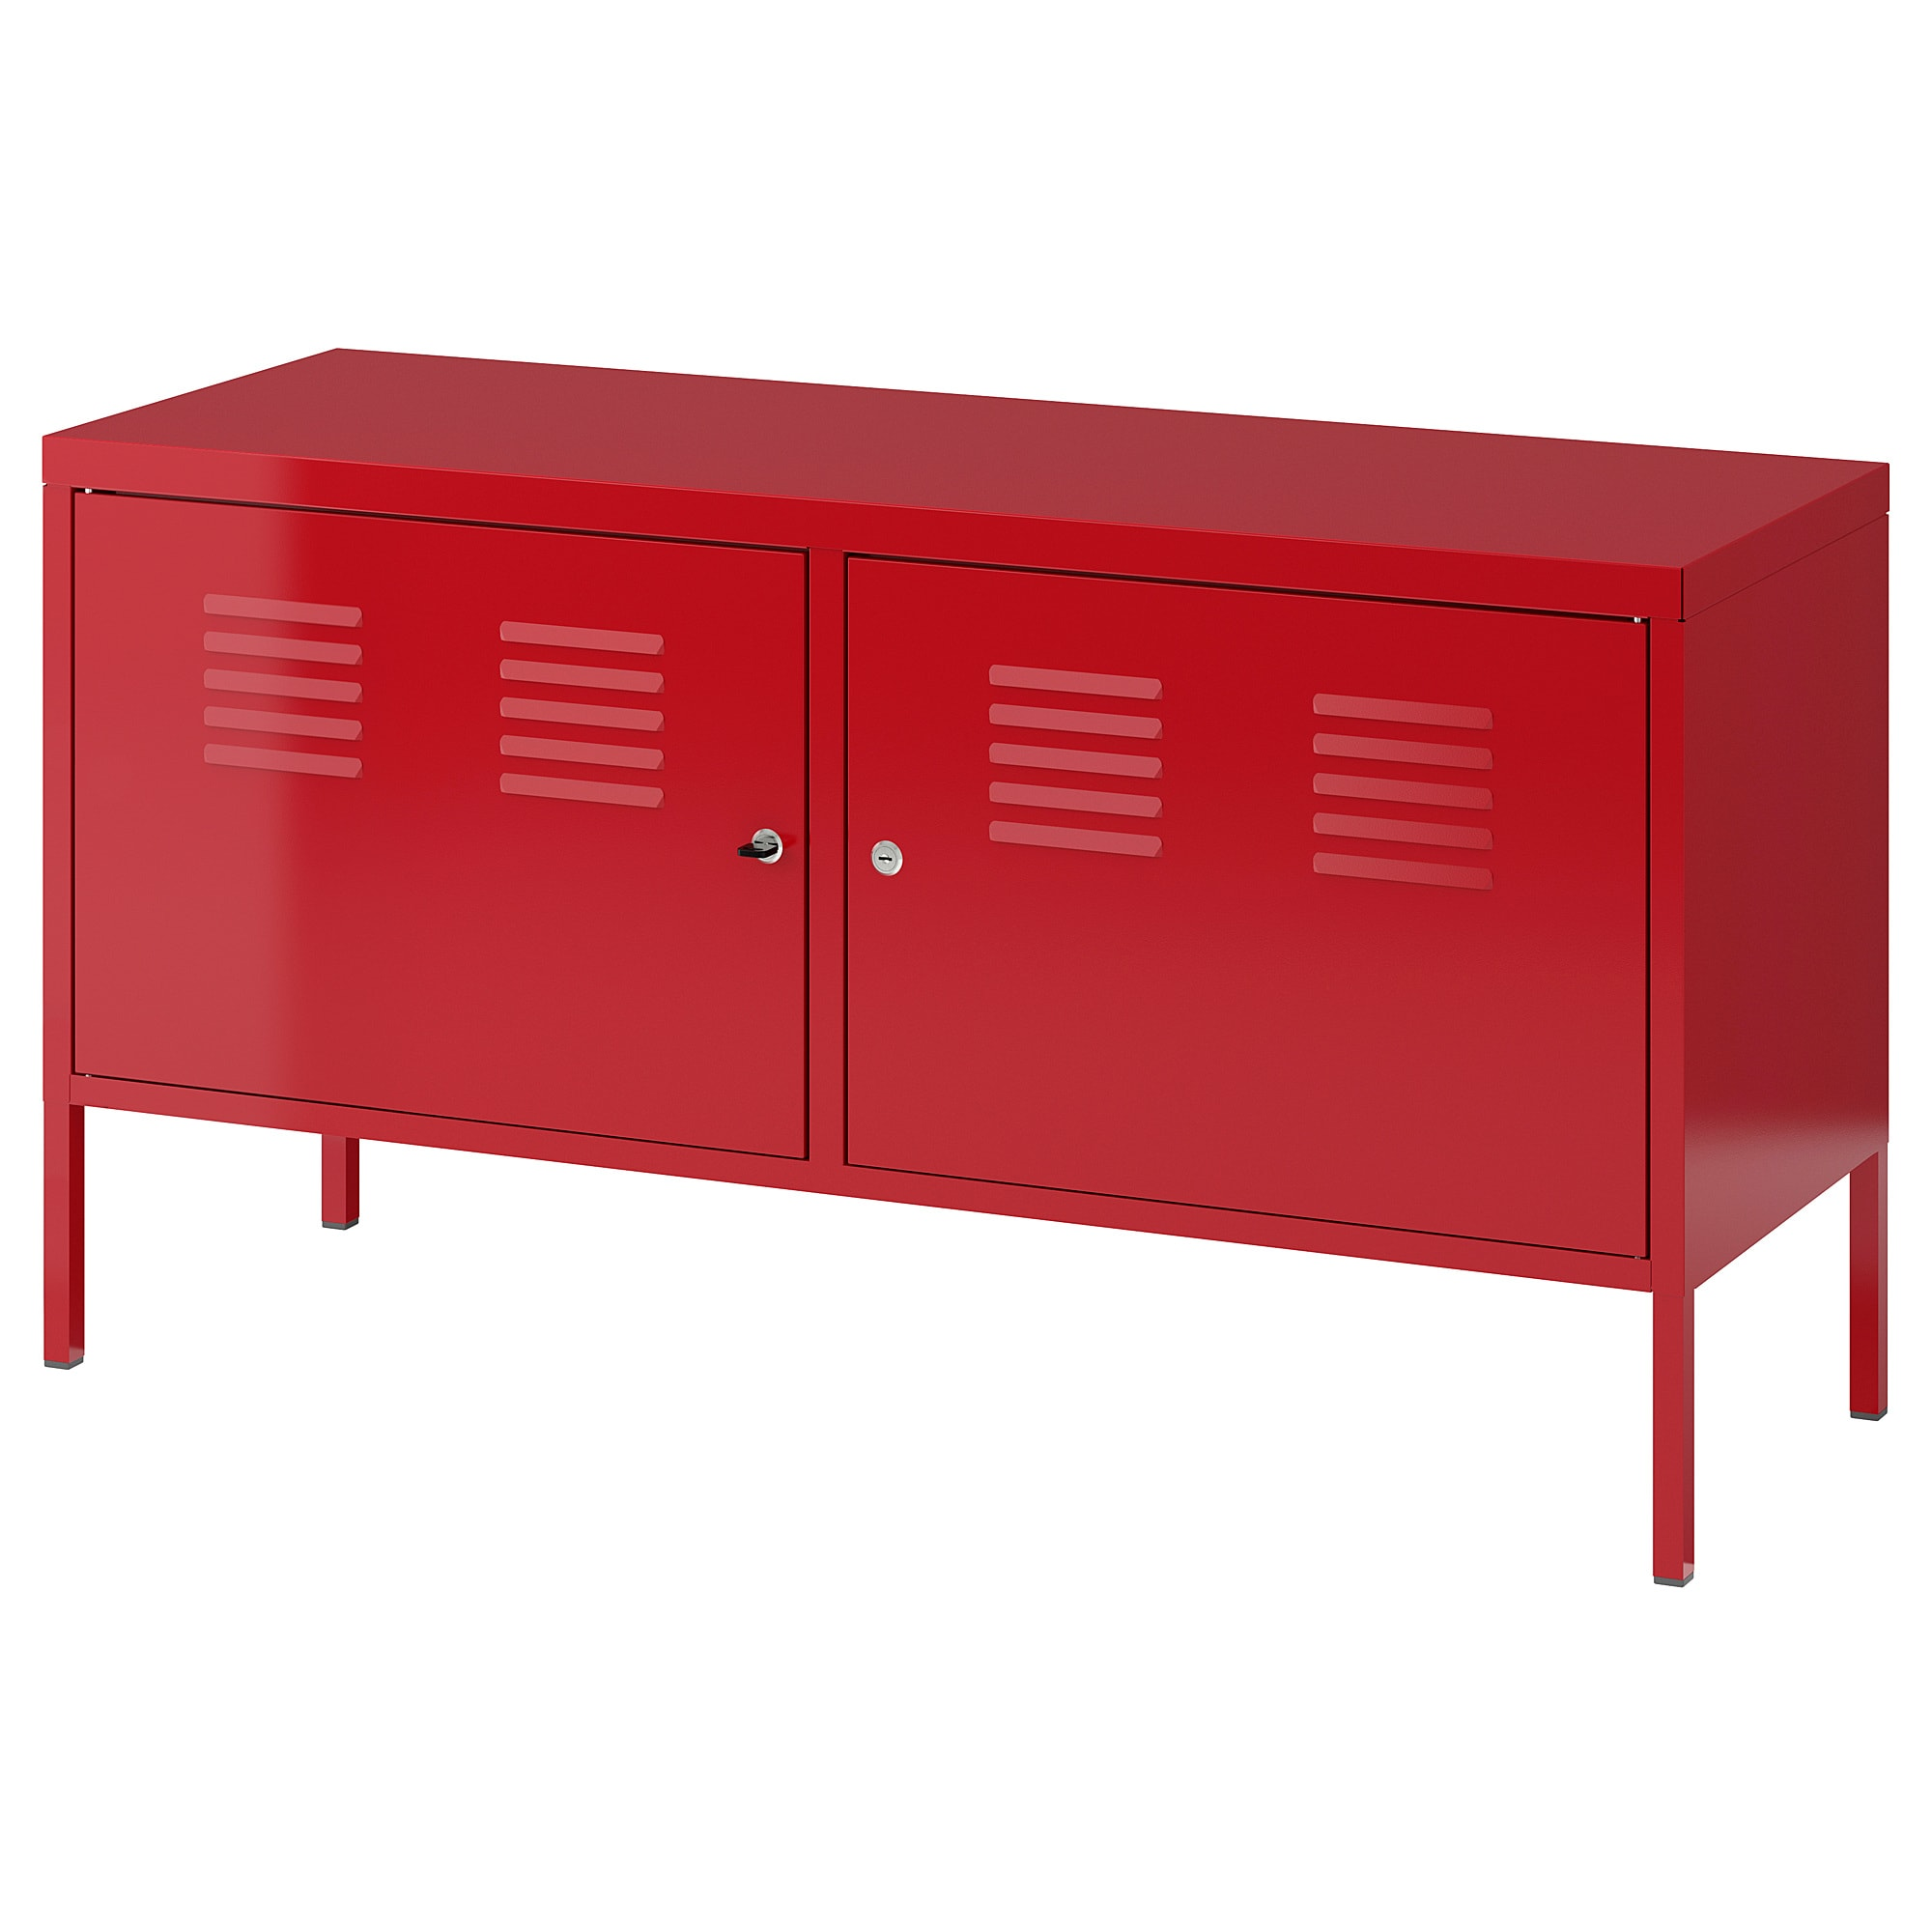 Ikea Ps Cabinet Red 46 7 8x24 3 4 Ikea Ikea Ps Cabinet Ikea Ps Ikea